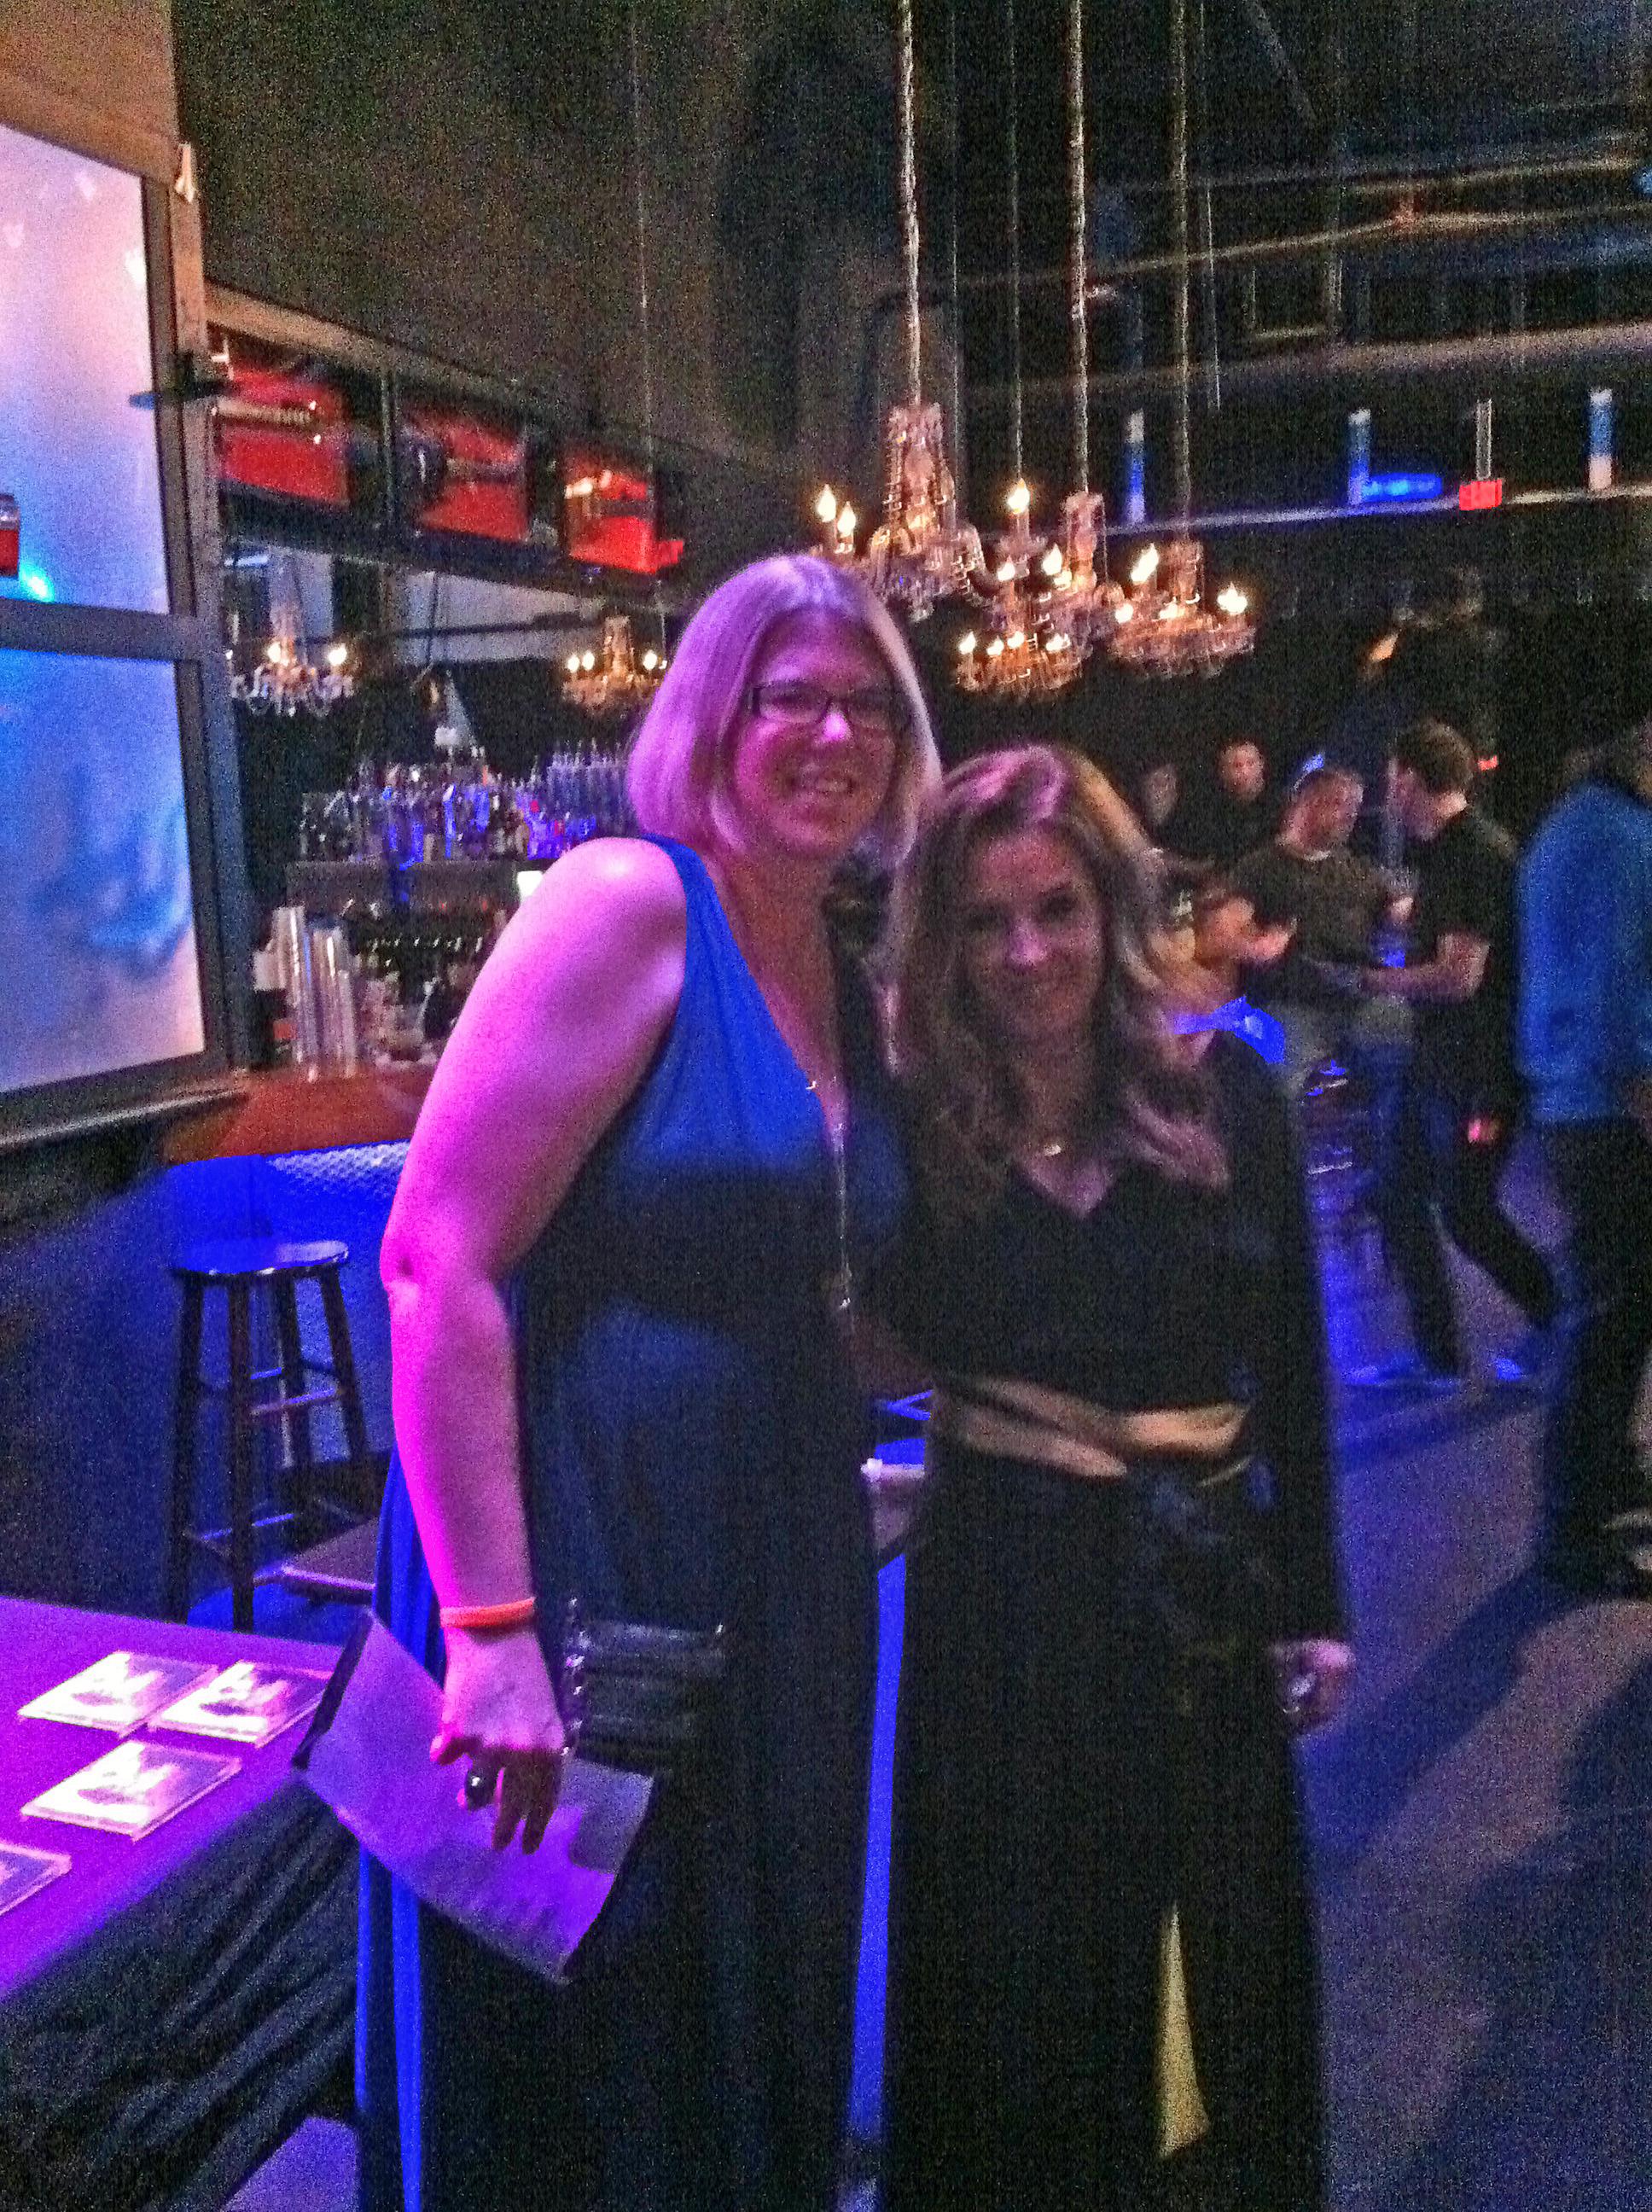 Me and Lisa Marie Presley6.15.12